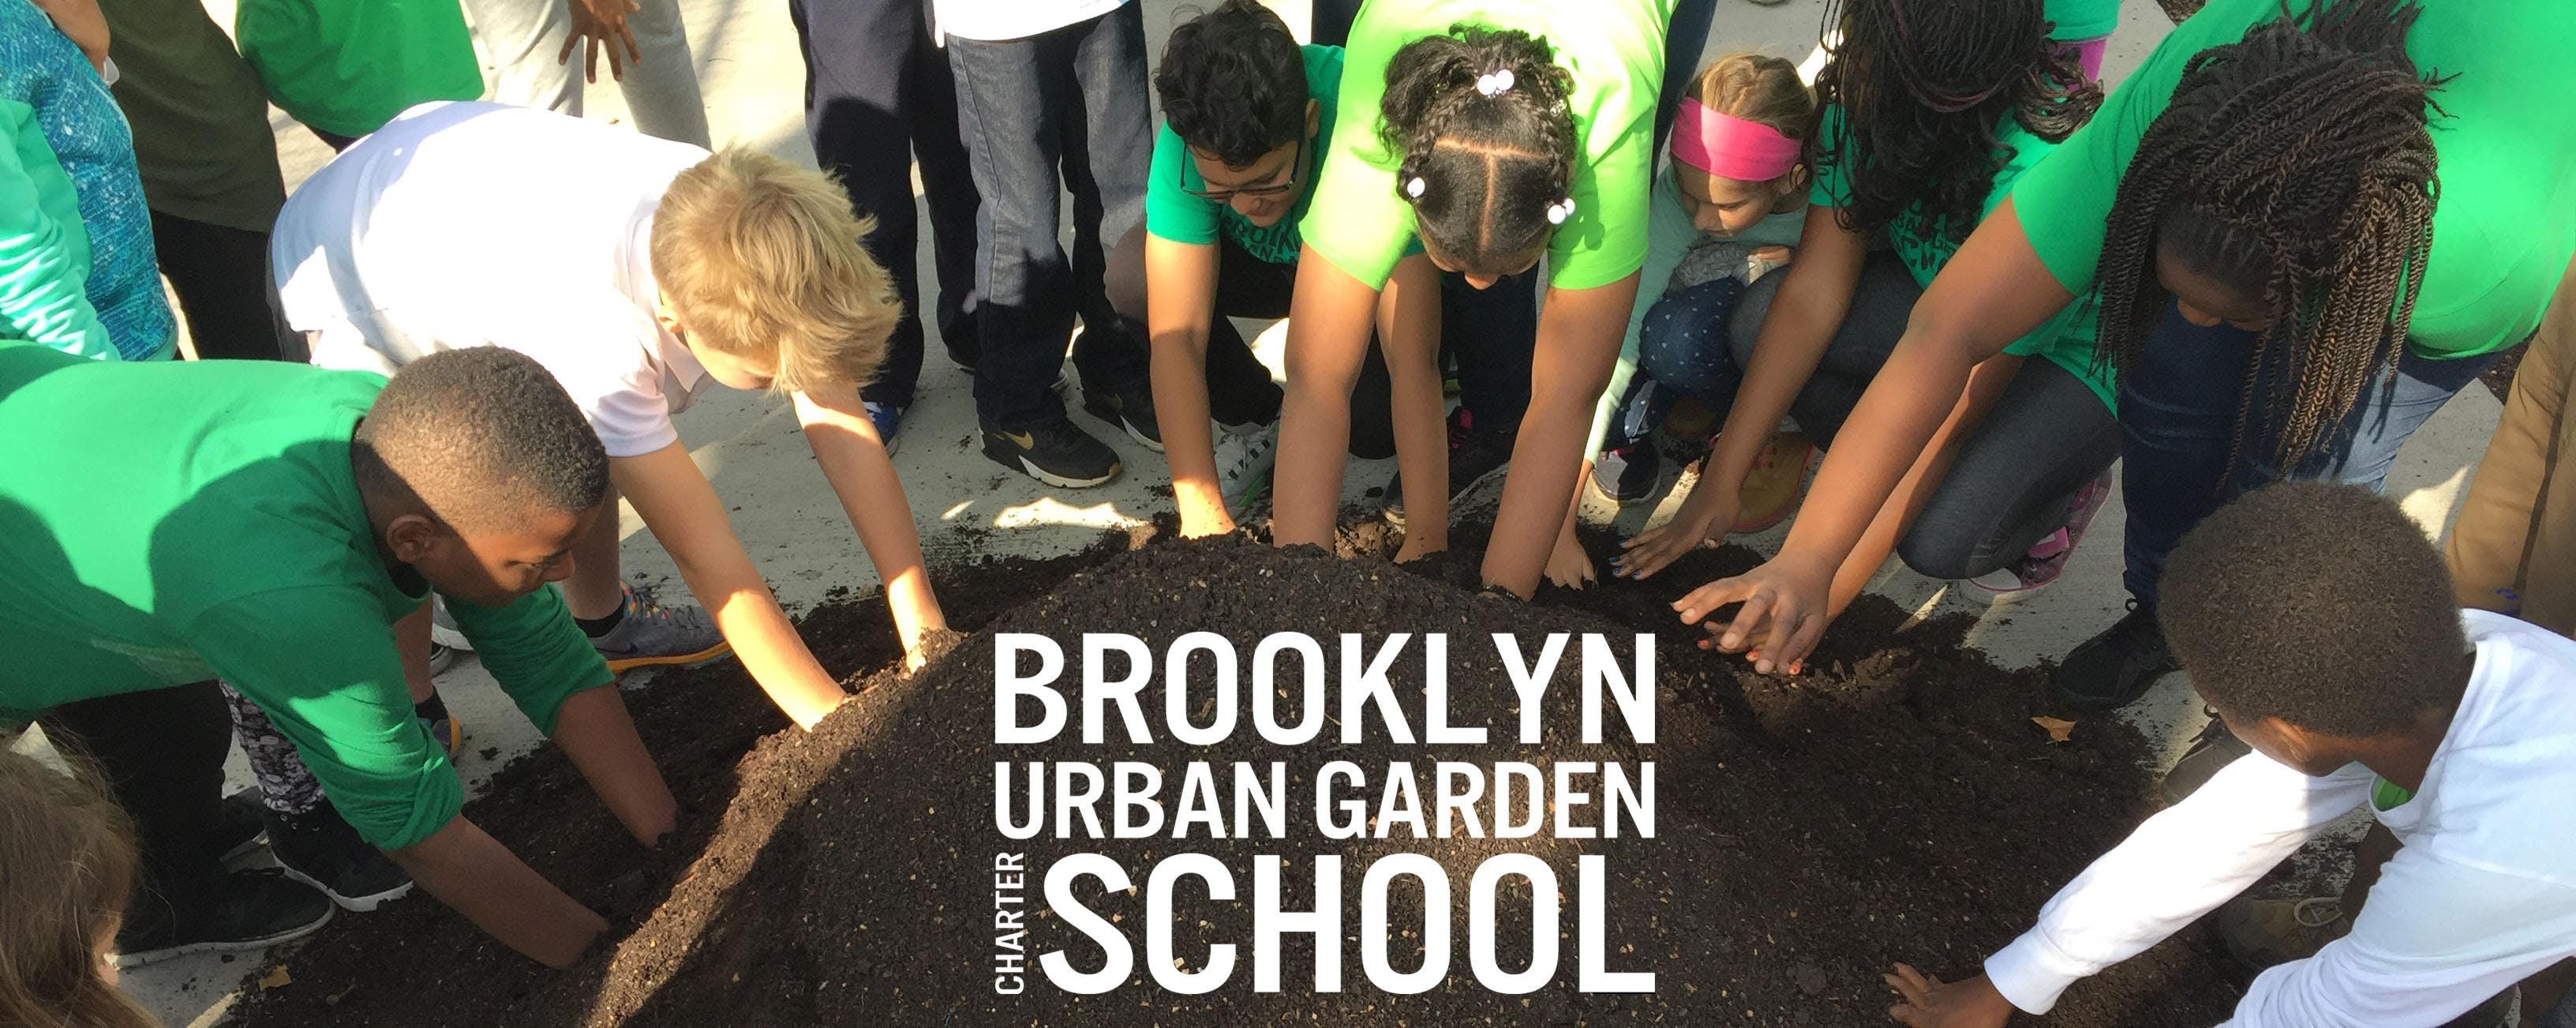 Marvelous Follow Brooklyn Urban Garden Charter School (BUGS). BUGS School Day Tour